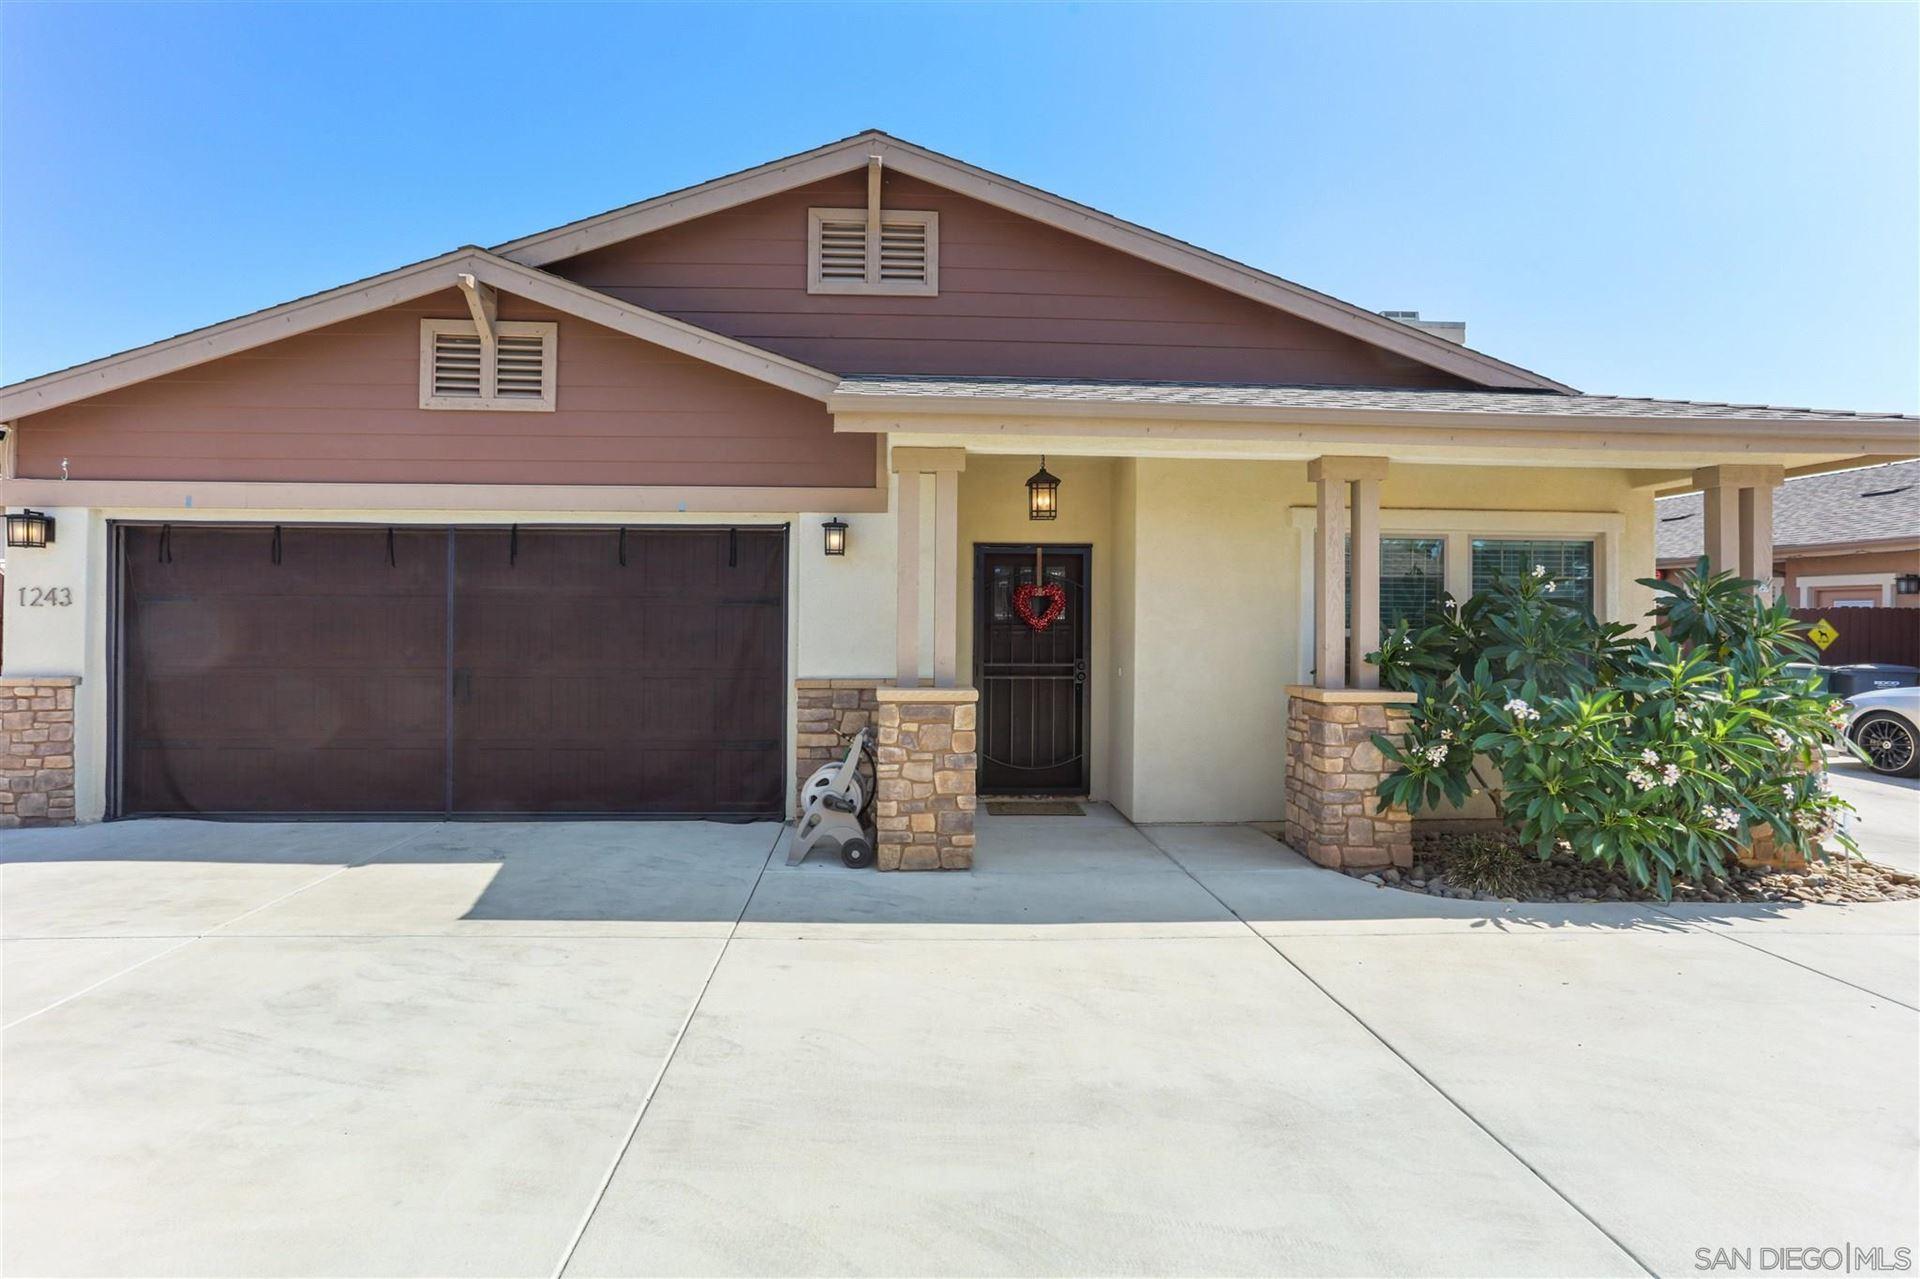 Photo of 1243 Peach Avenue, El Cajon, CA 92021 (MLS # 210021264)